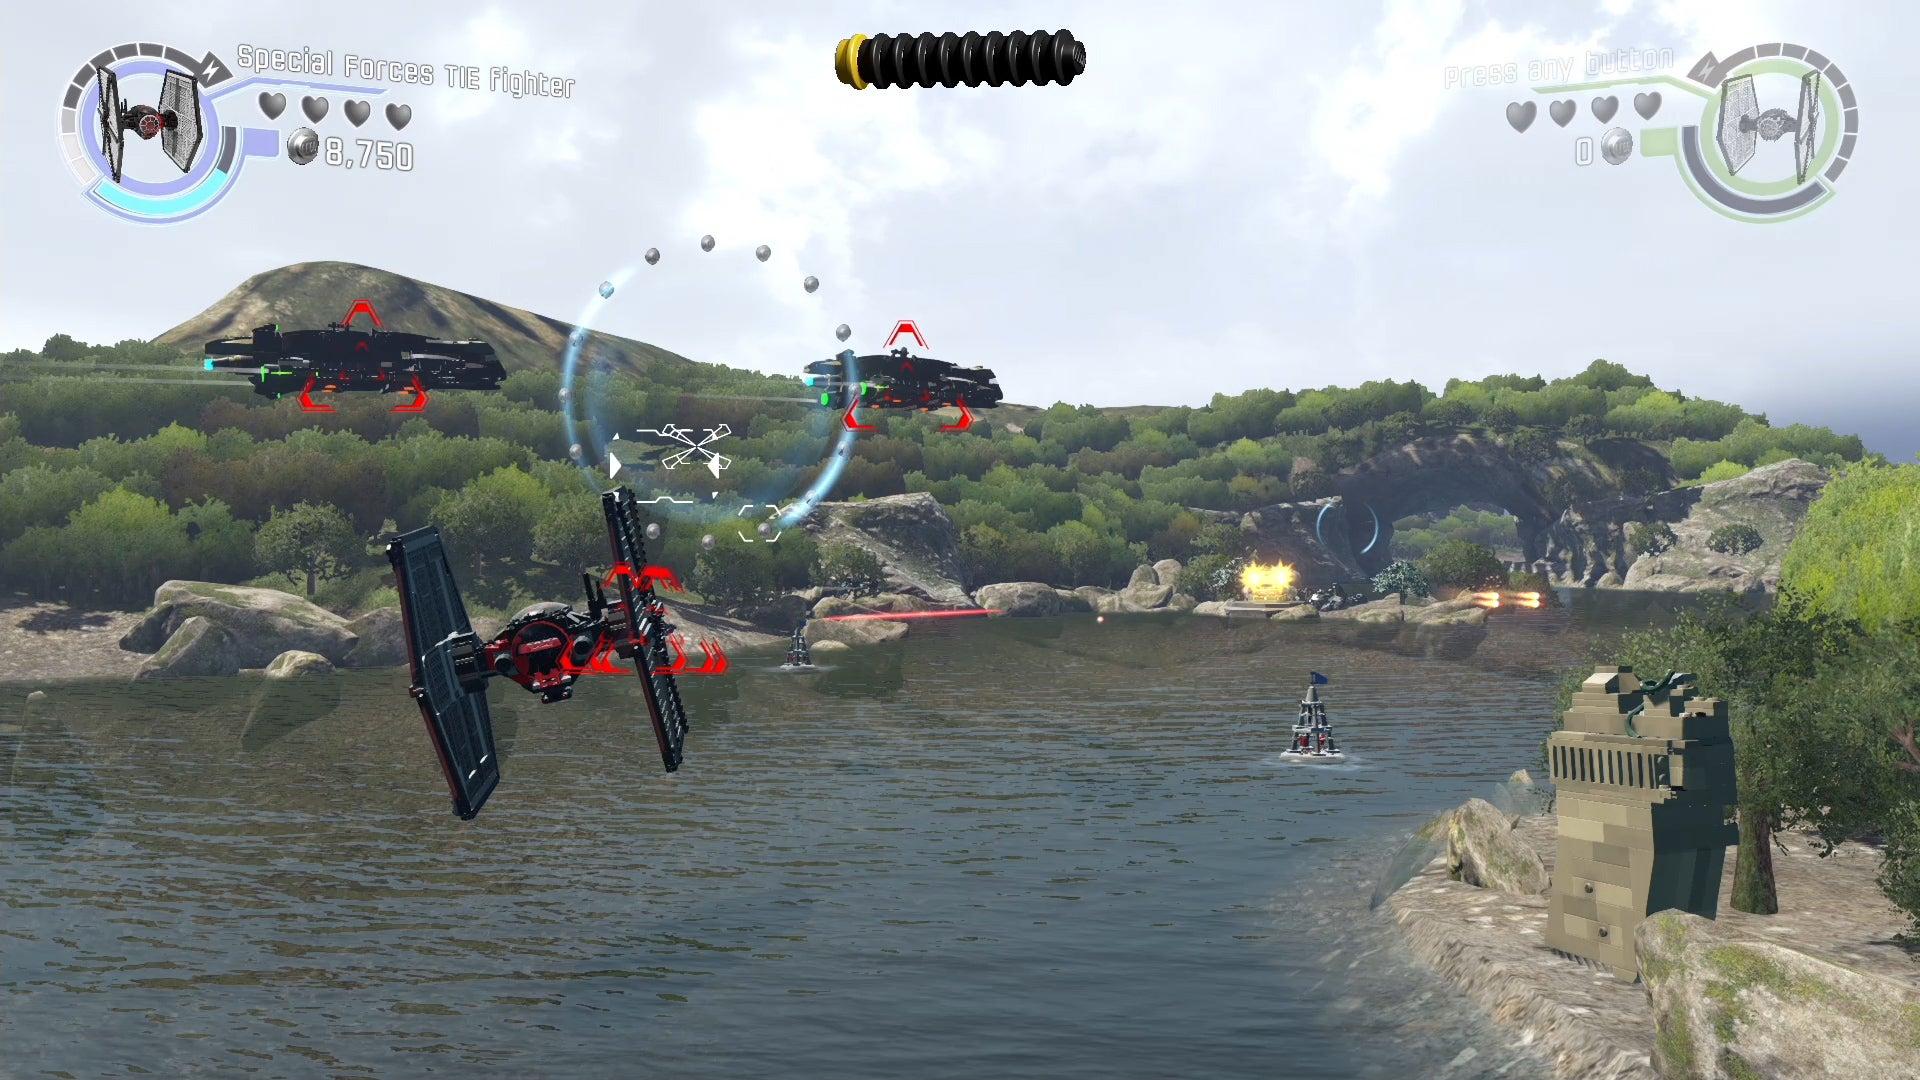 LEGO Star Wars Siege Of Takodana Lets You Play As The Bad Guys